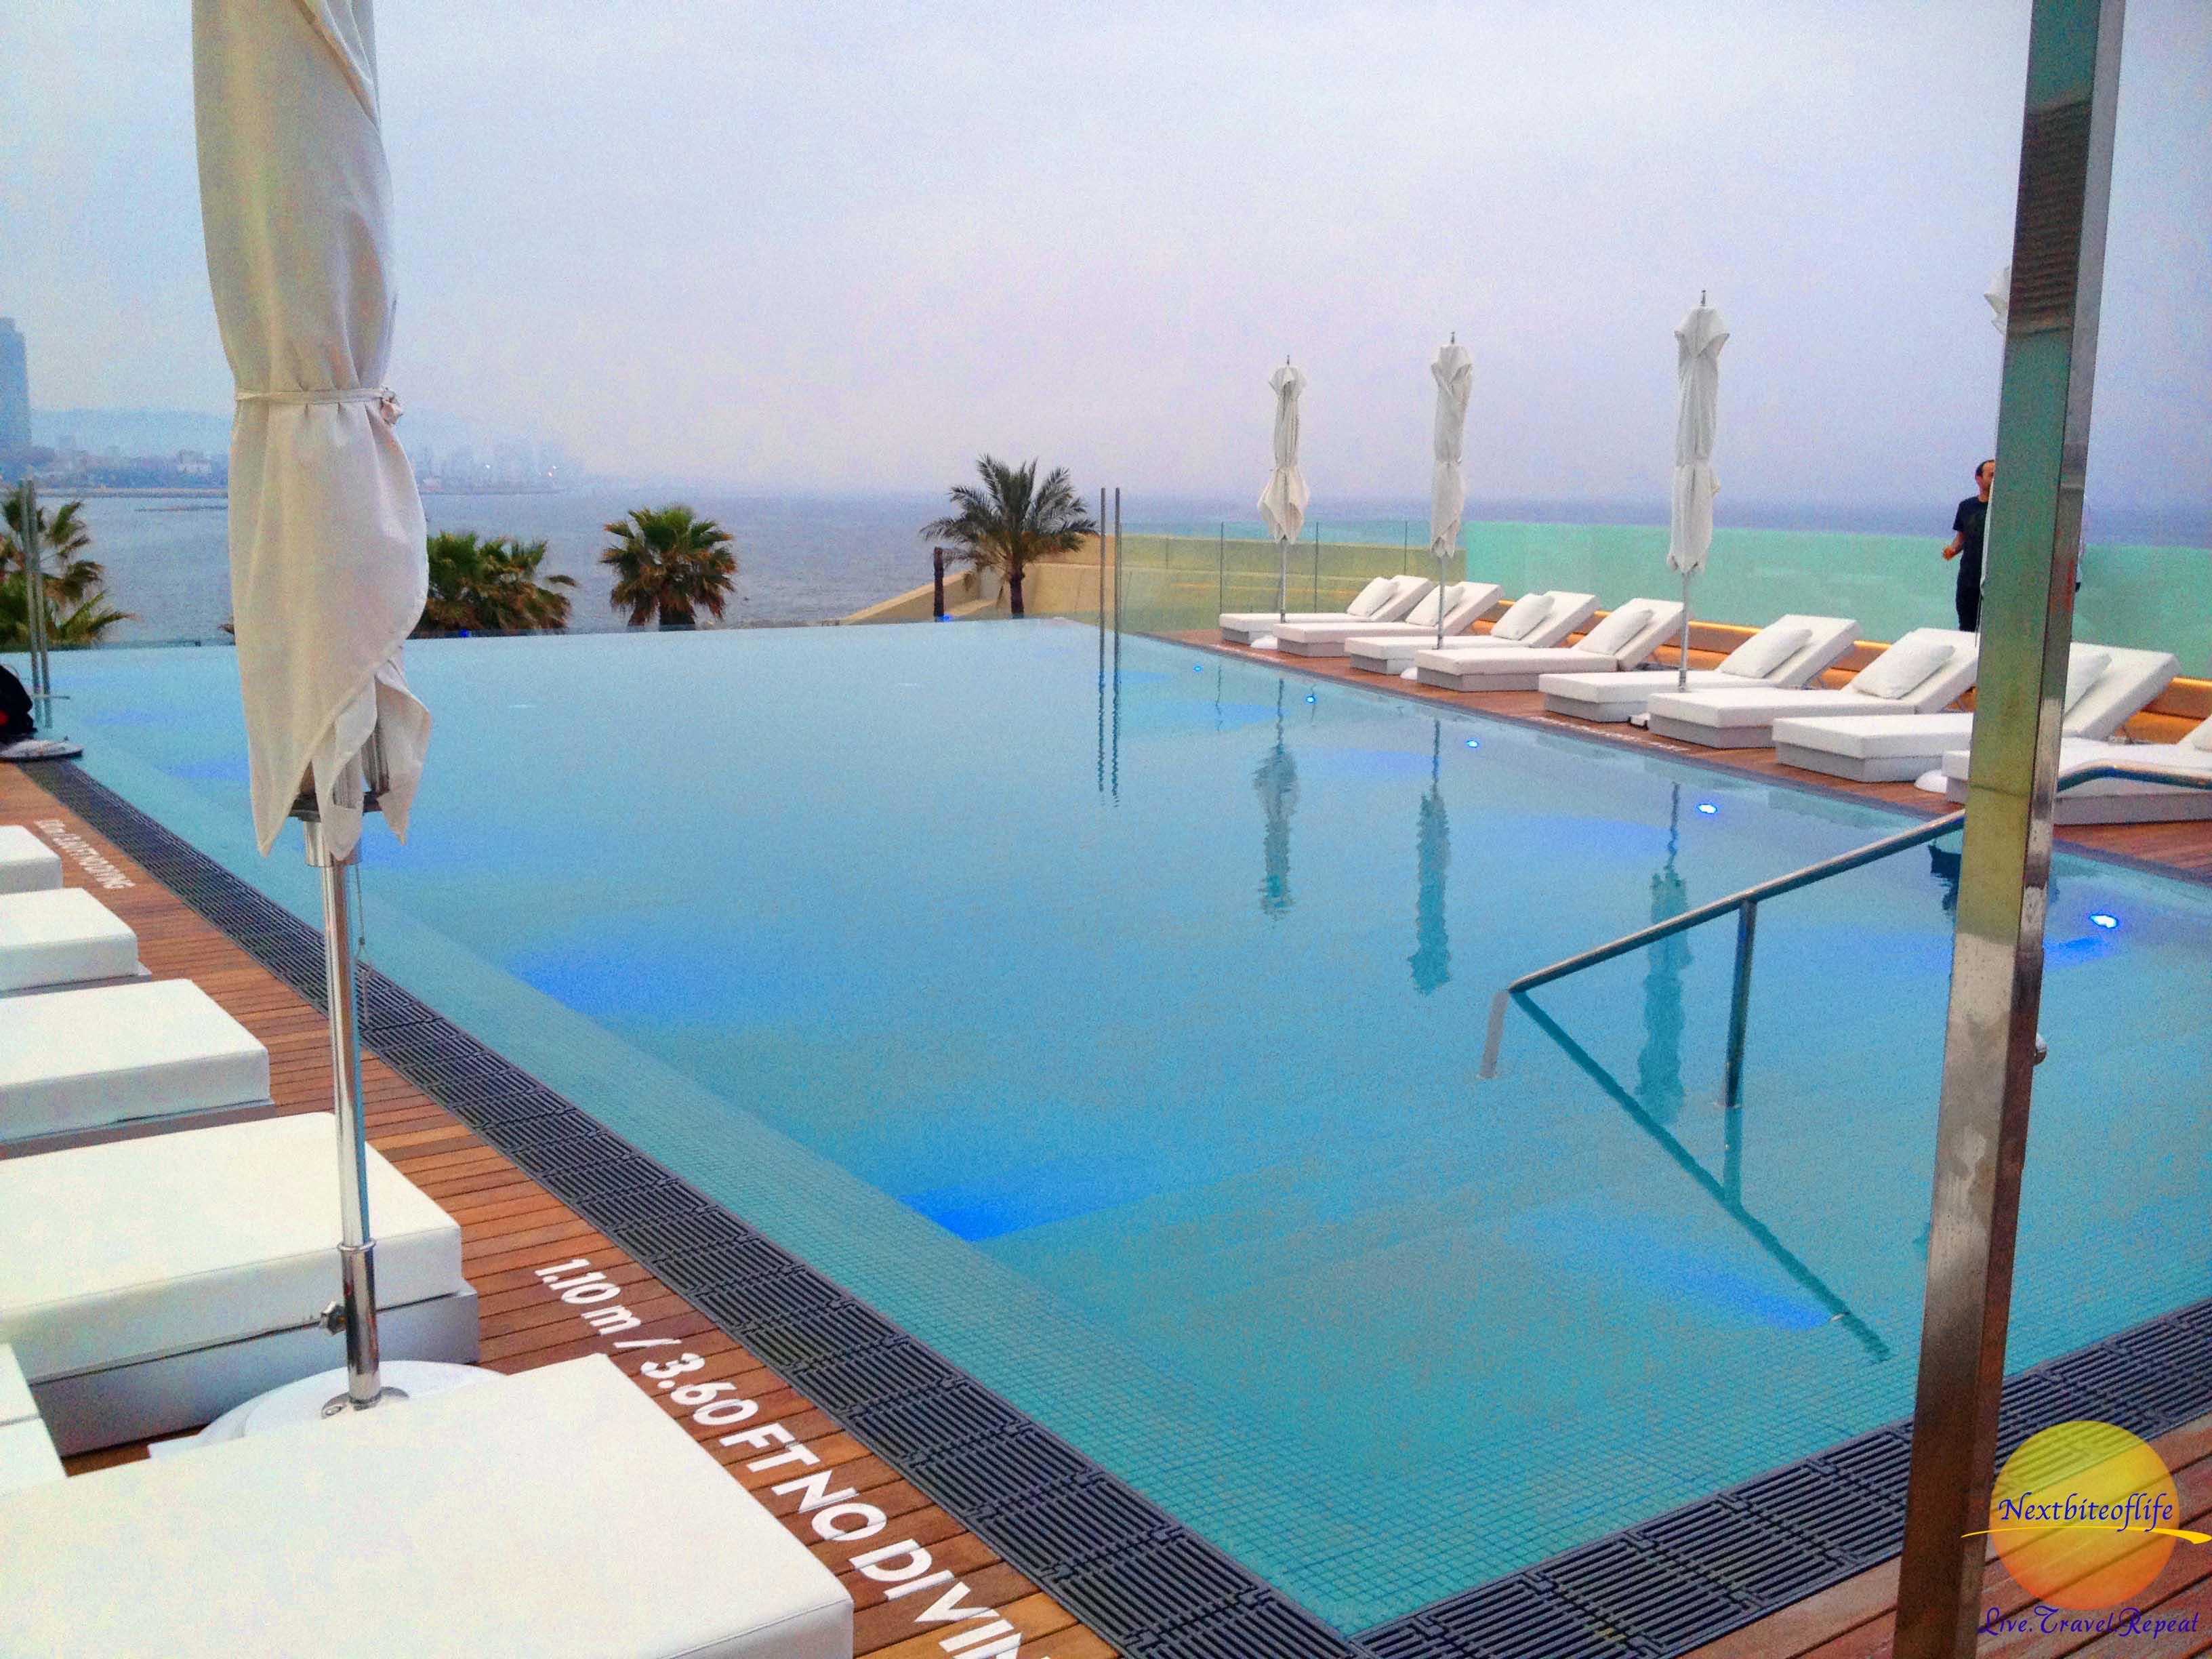 W Barcelona Luxury Dream Hotel Nextbiteoflife